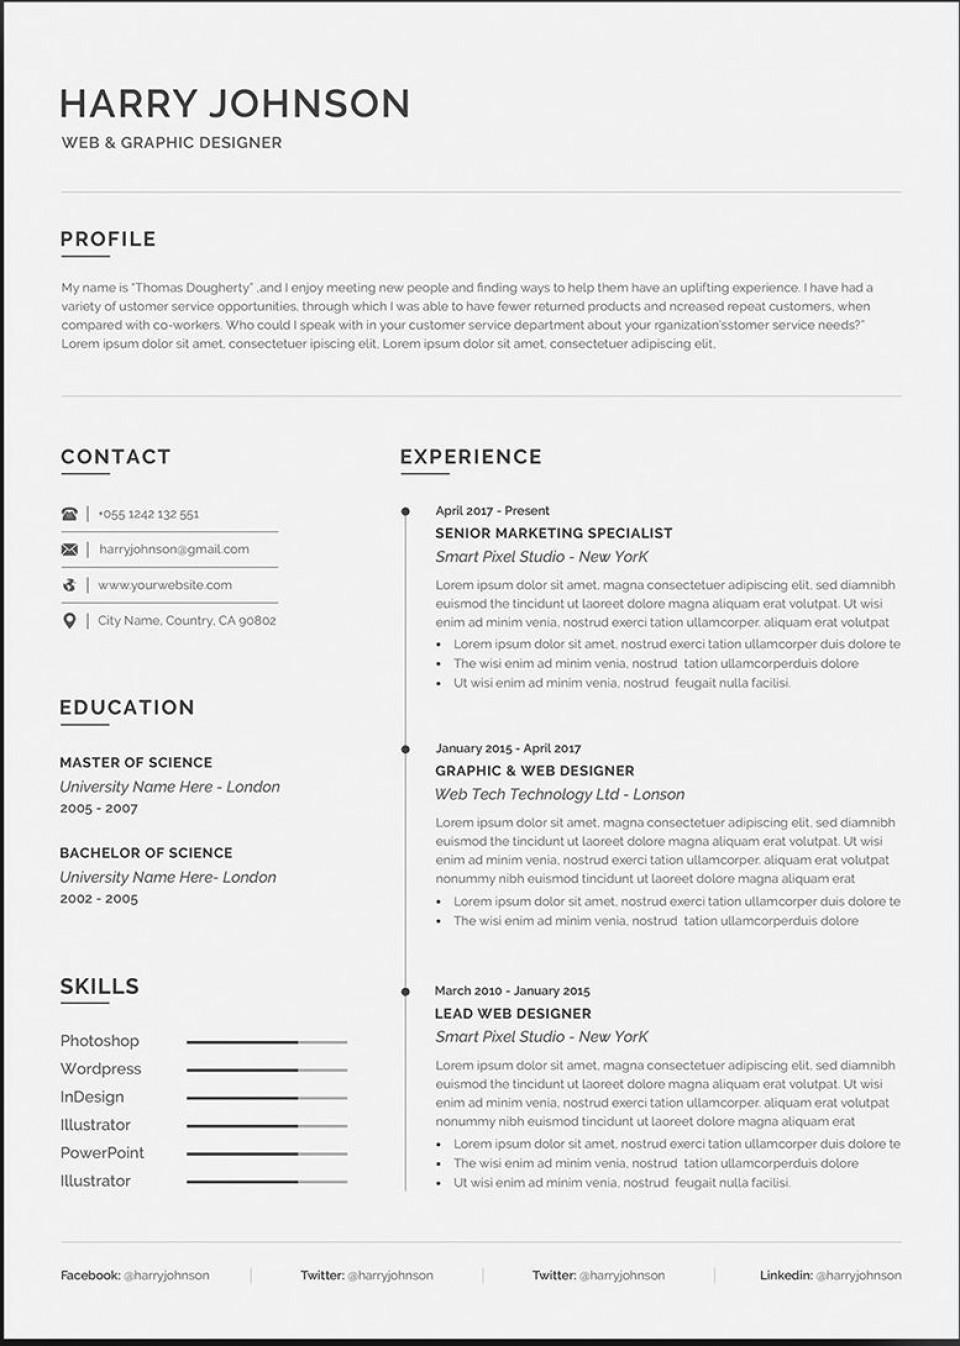 003 Wonderful Resume Microsoft Word Template Image  Cv/resume Design Tutorial With Federal Download960